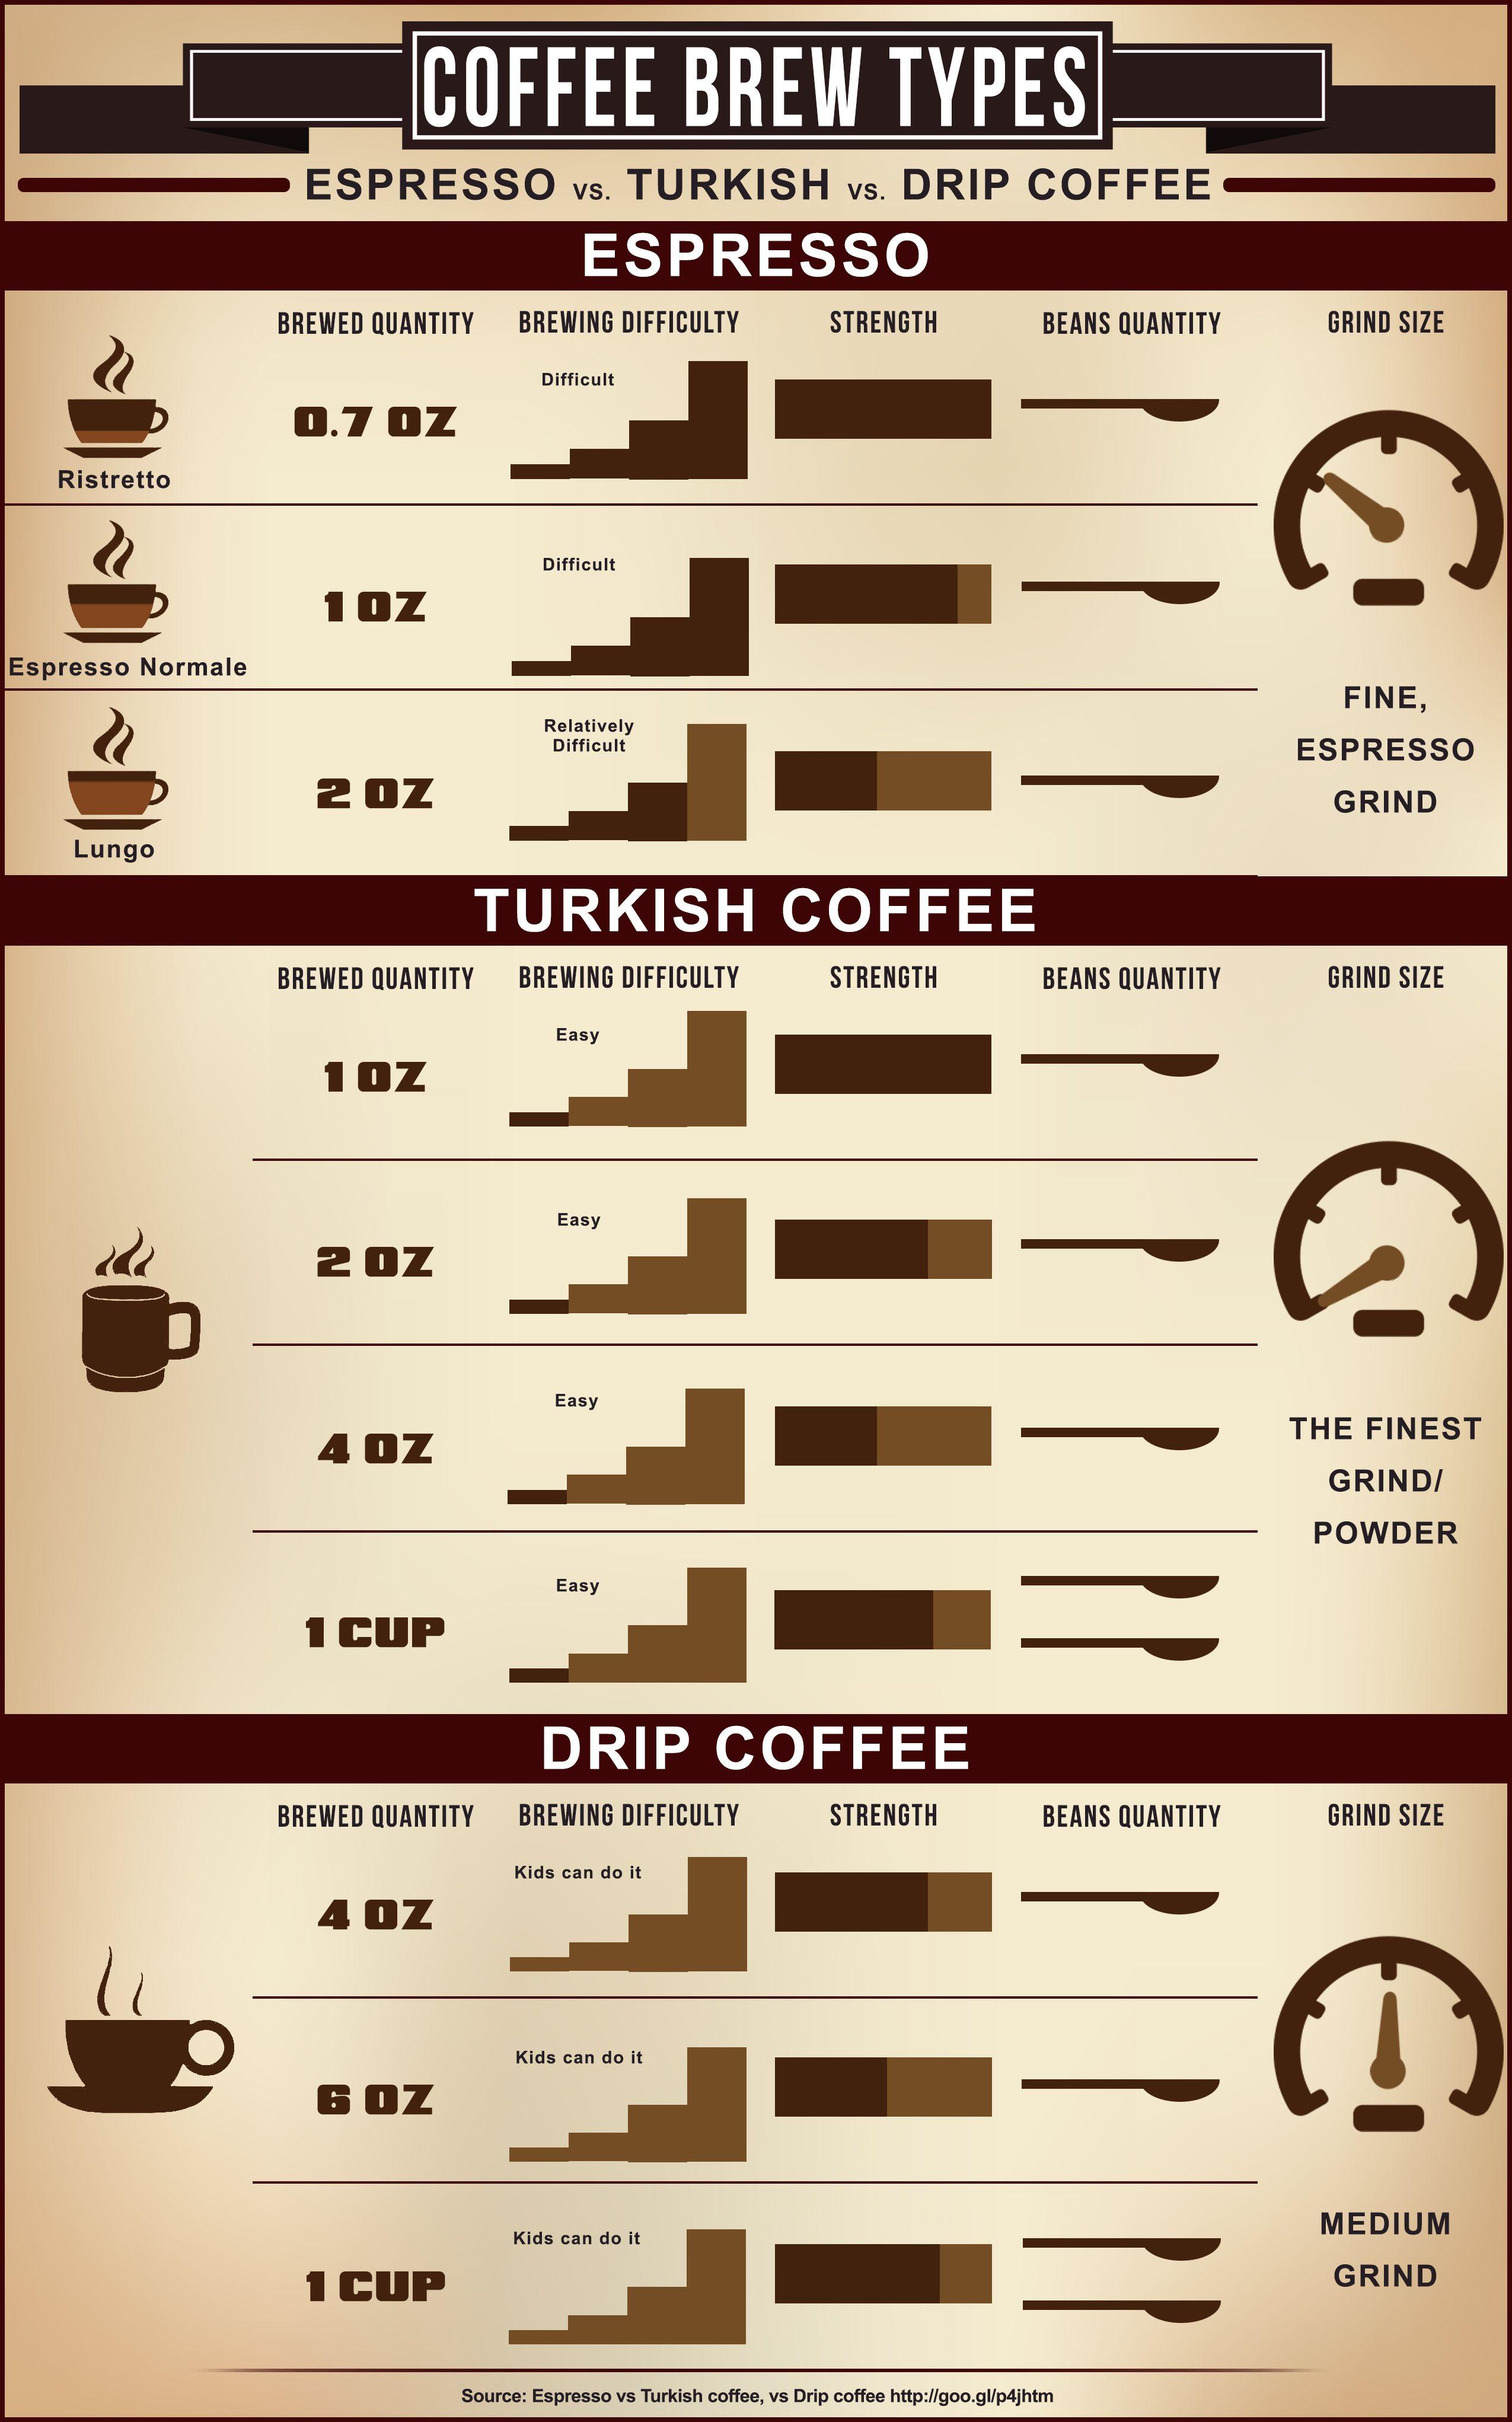 Espresso Versus Turkish Coffee Versus Drip Coffee Resep Kopi Pecinta Kopi Espresso